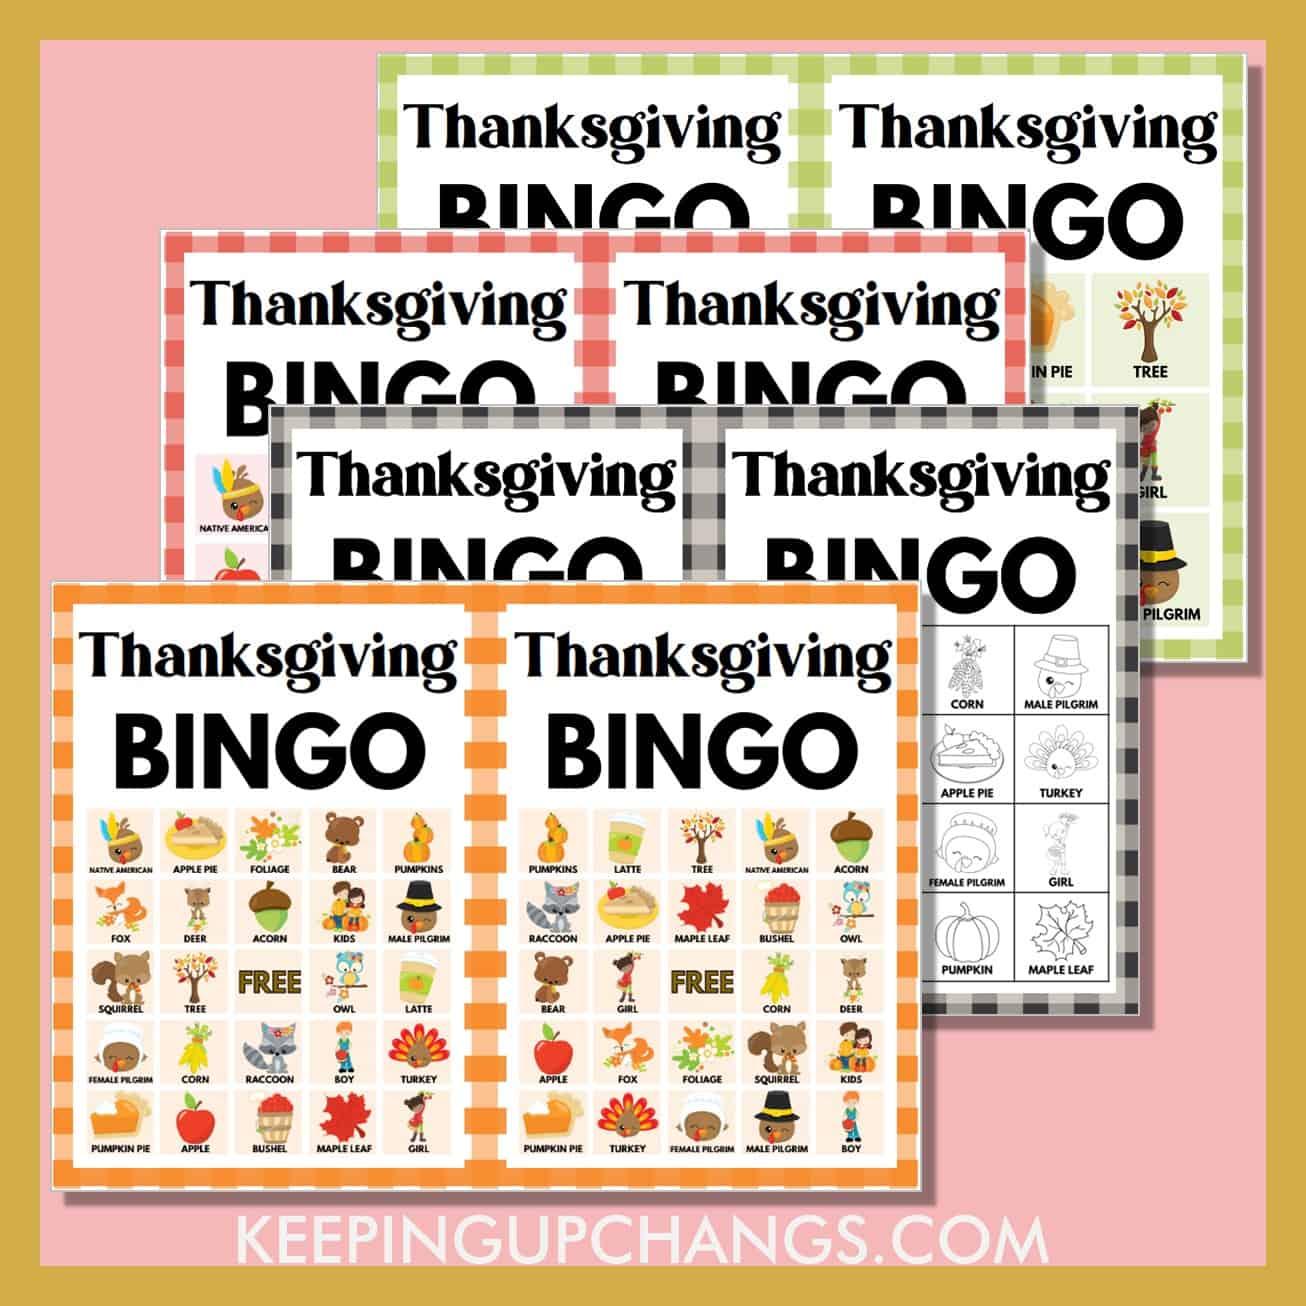 most popular free thanksgiving bingo games including 5x5, 4x4, 3x3 grids.